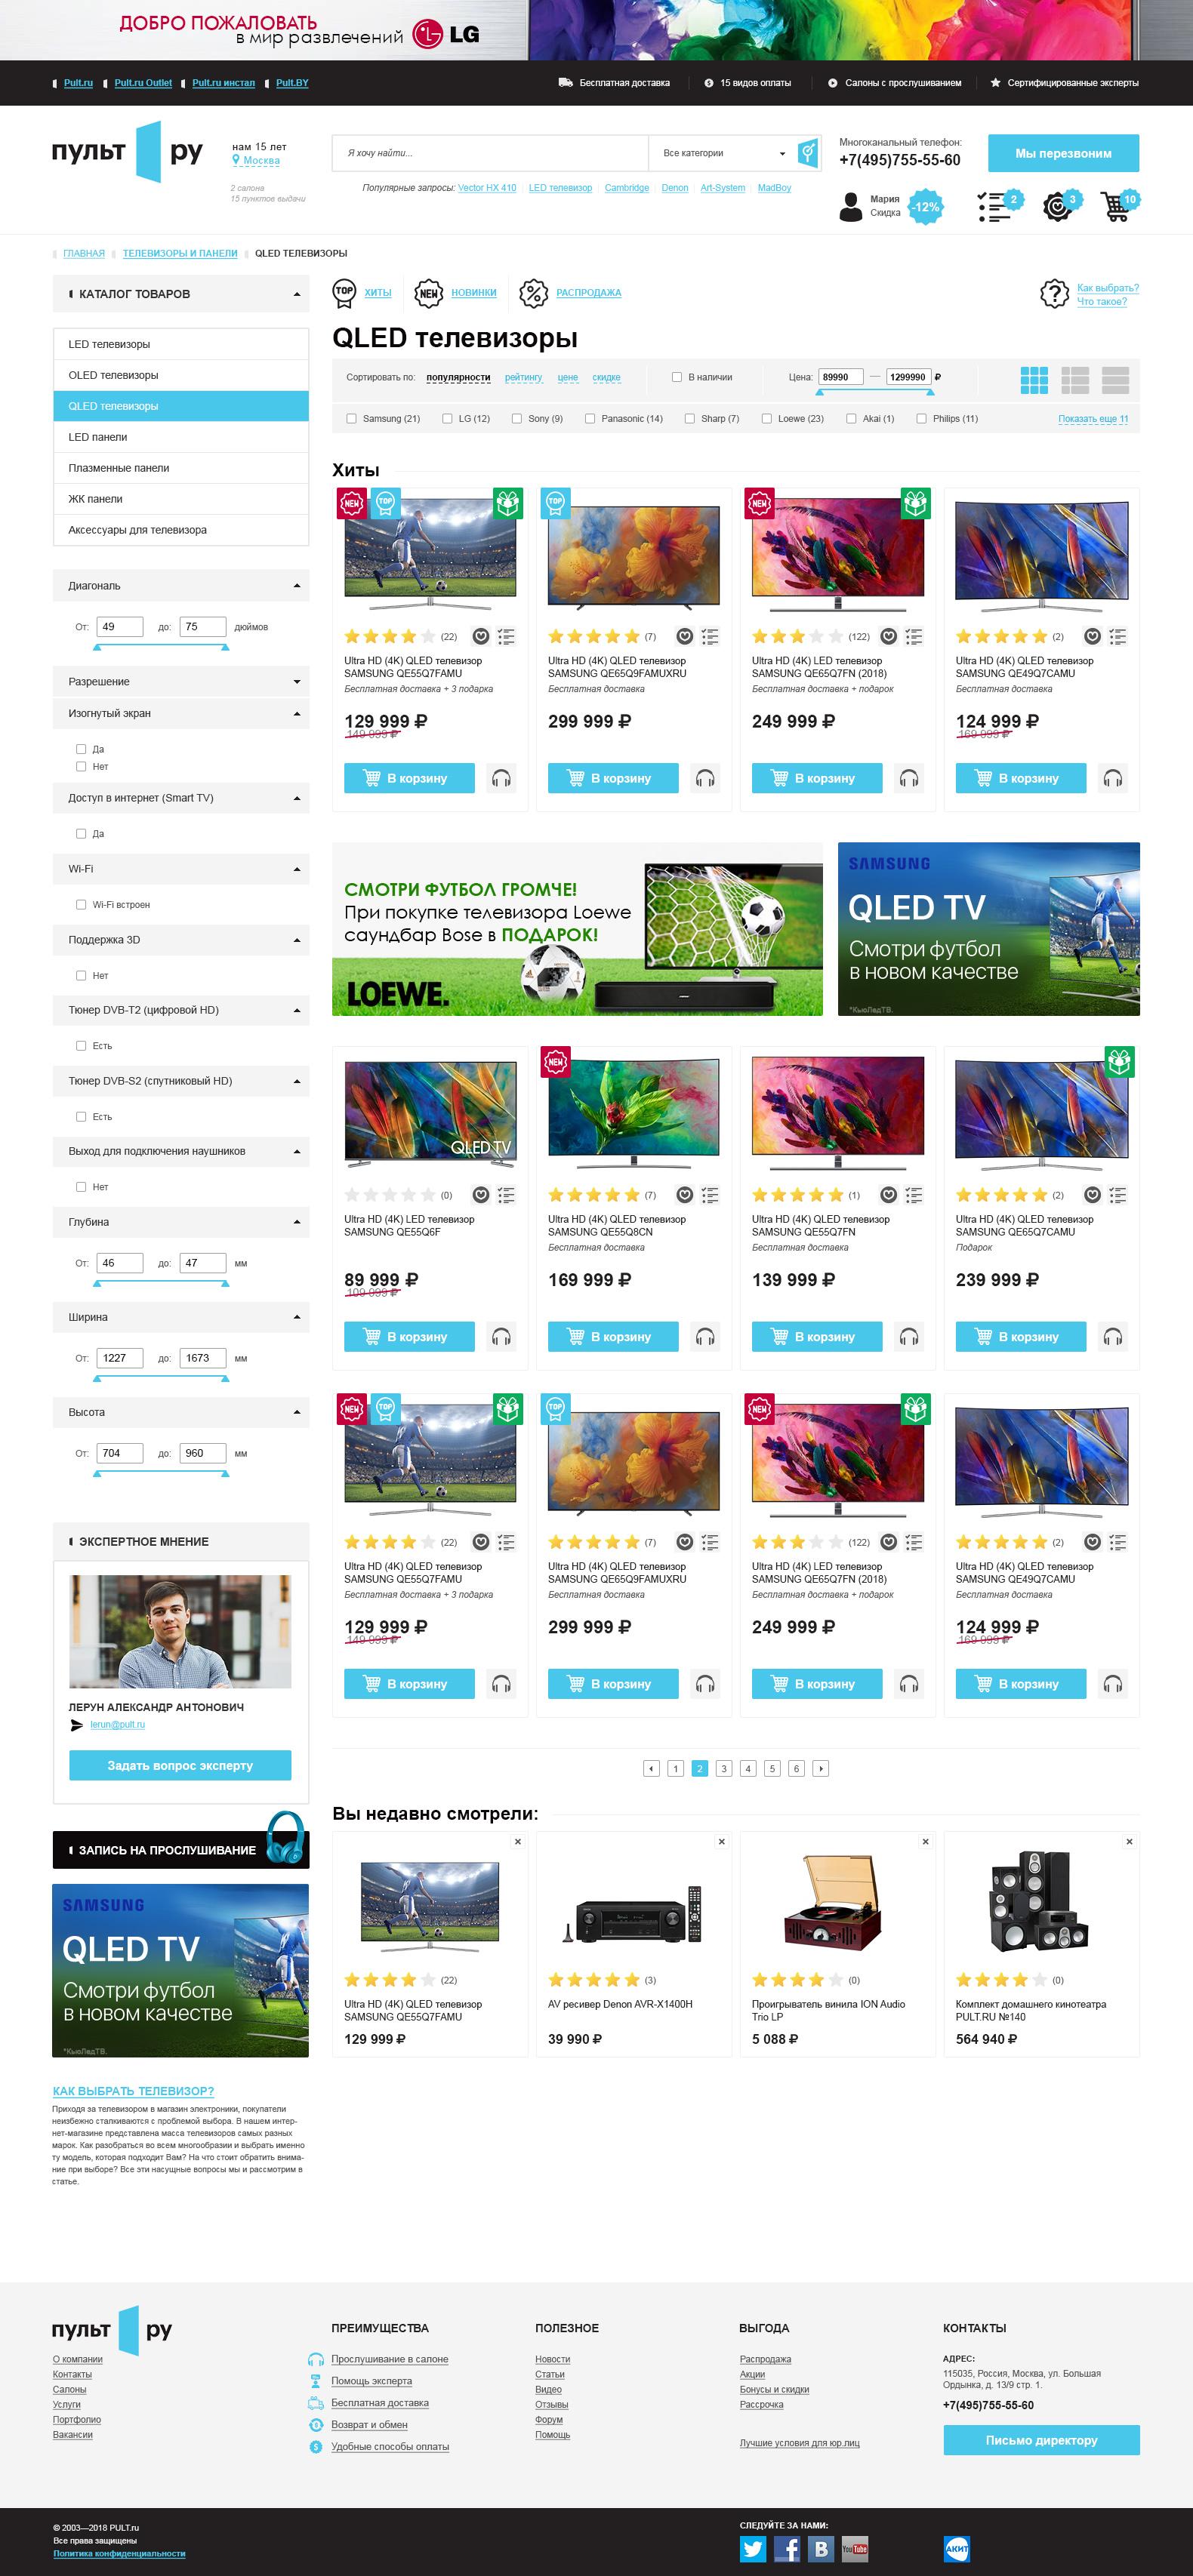 Дизайн 2ух страниц сайта PULT.ru фото f_7315b055df48a8e6.jpg